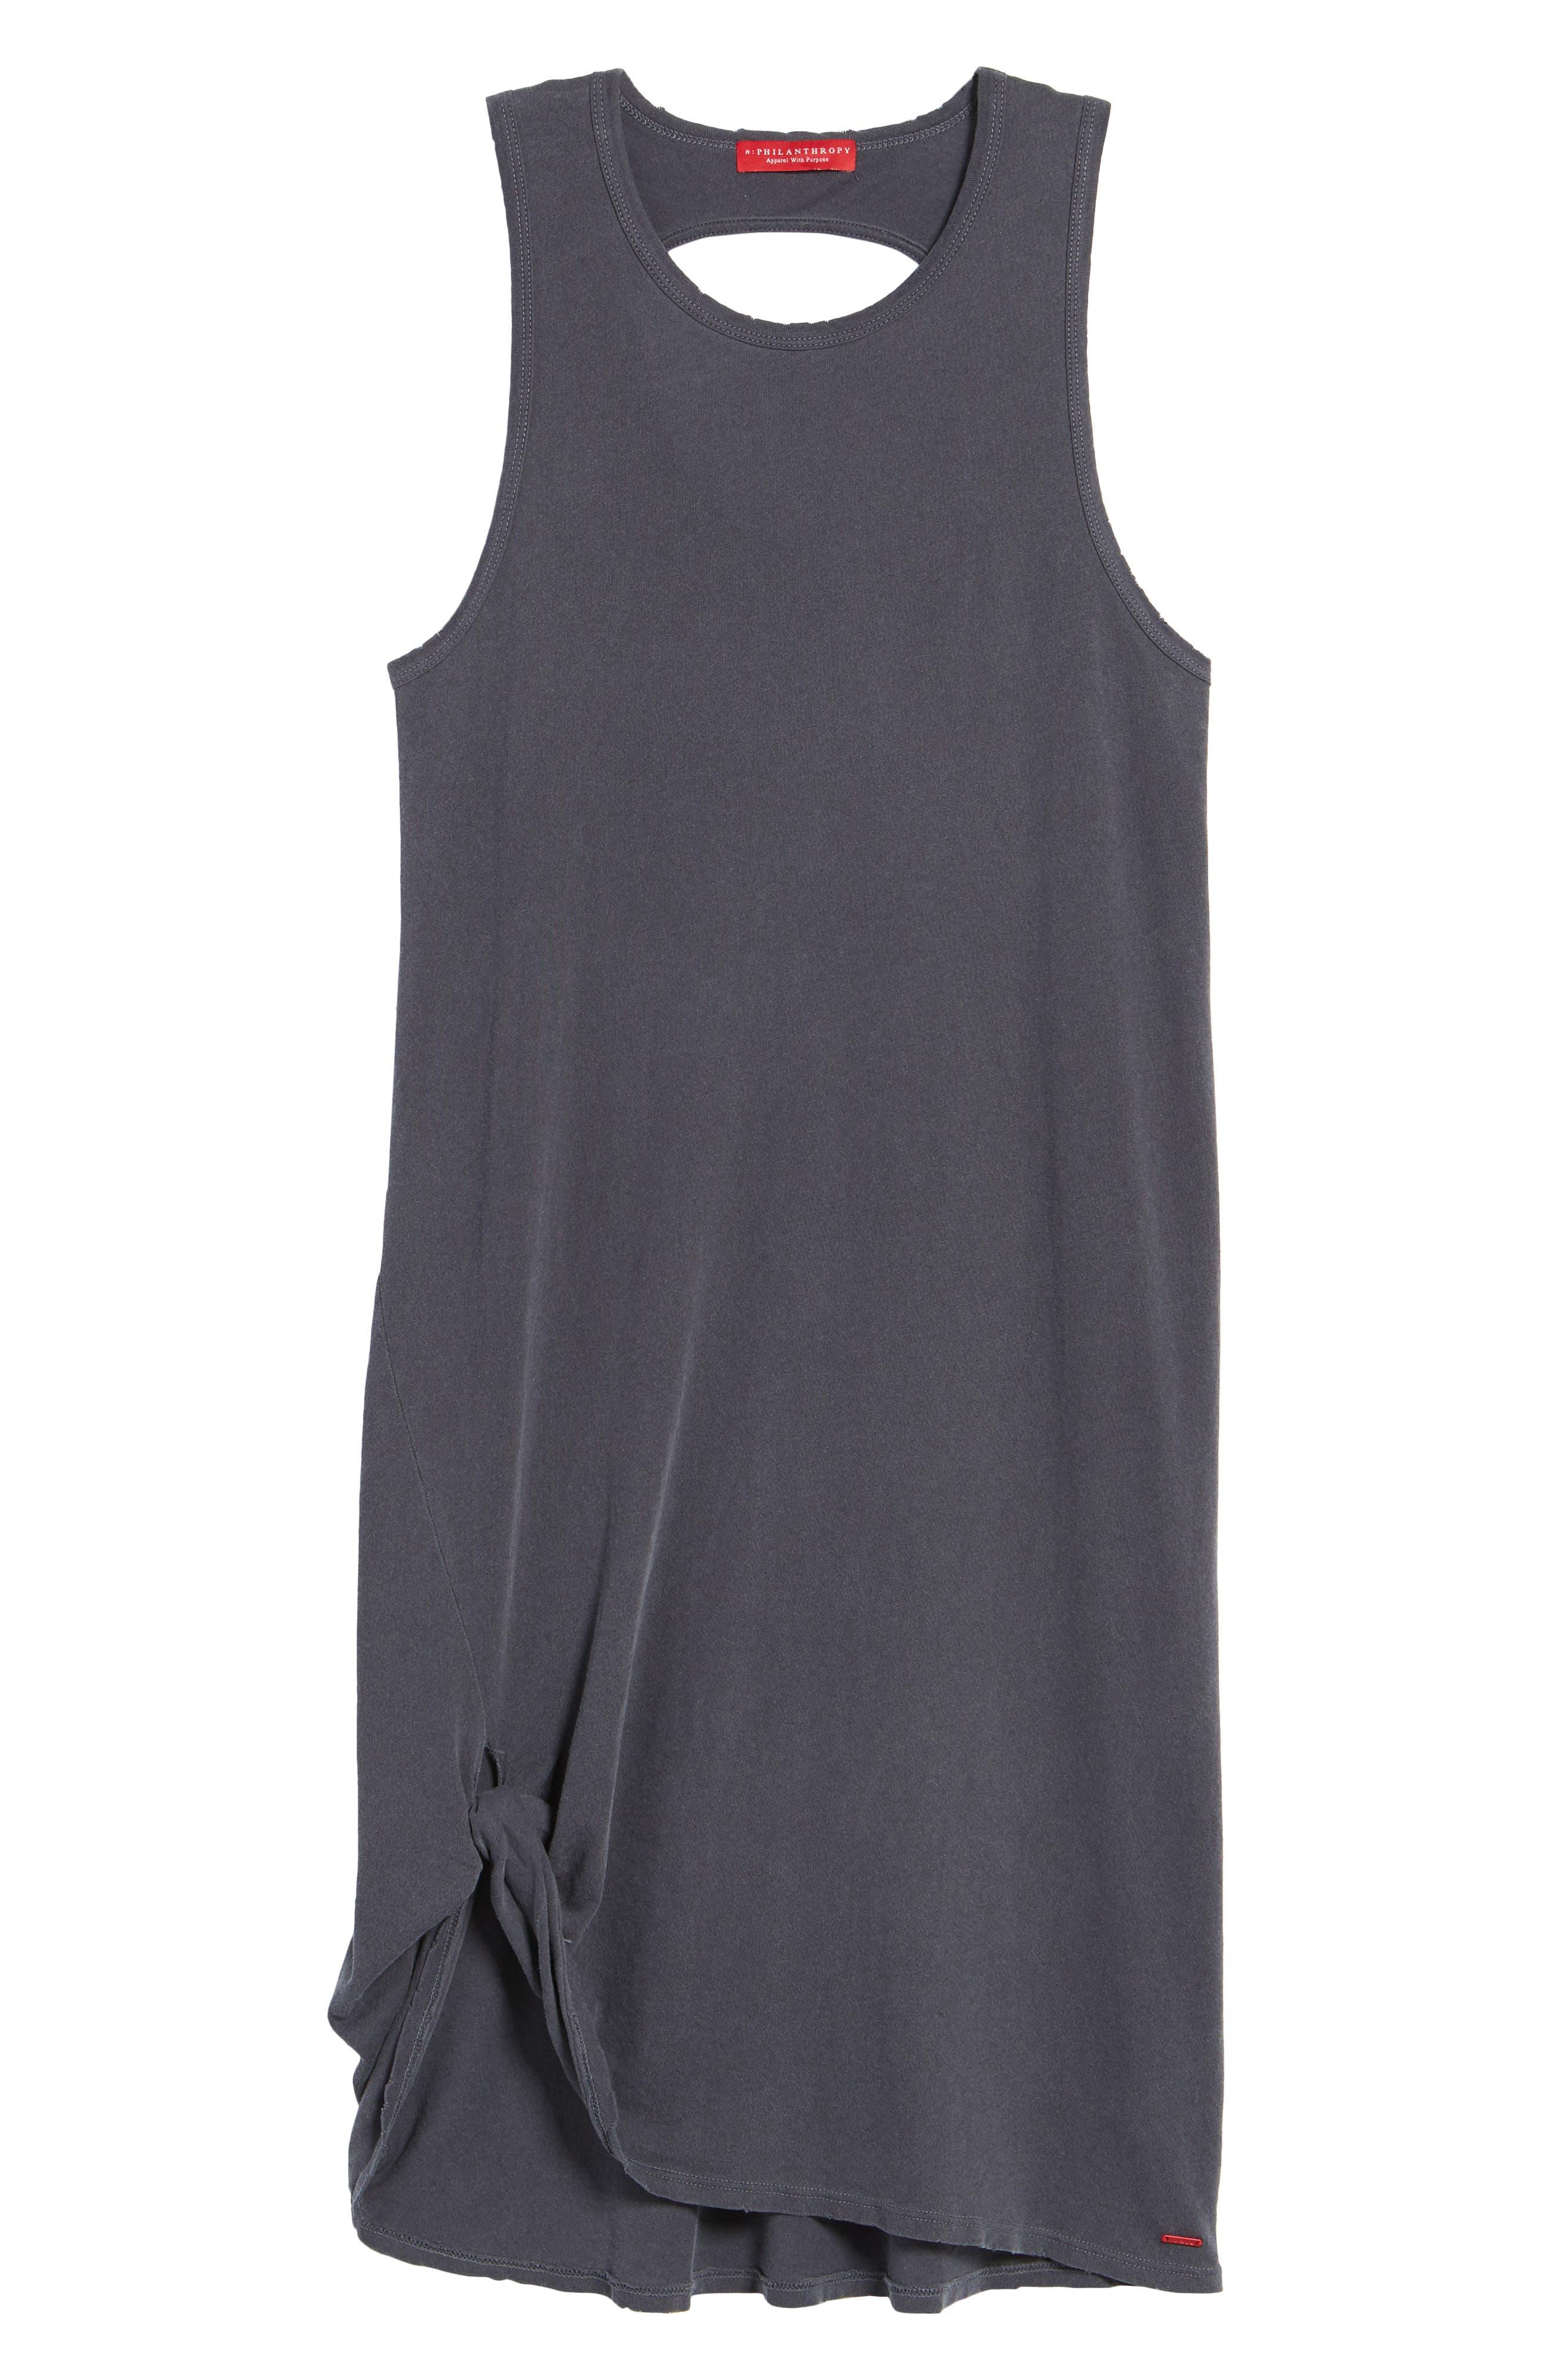 Boo Jersey Tank Dress,                             Alternate thumbnail 6, color,                             Asphalt